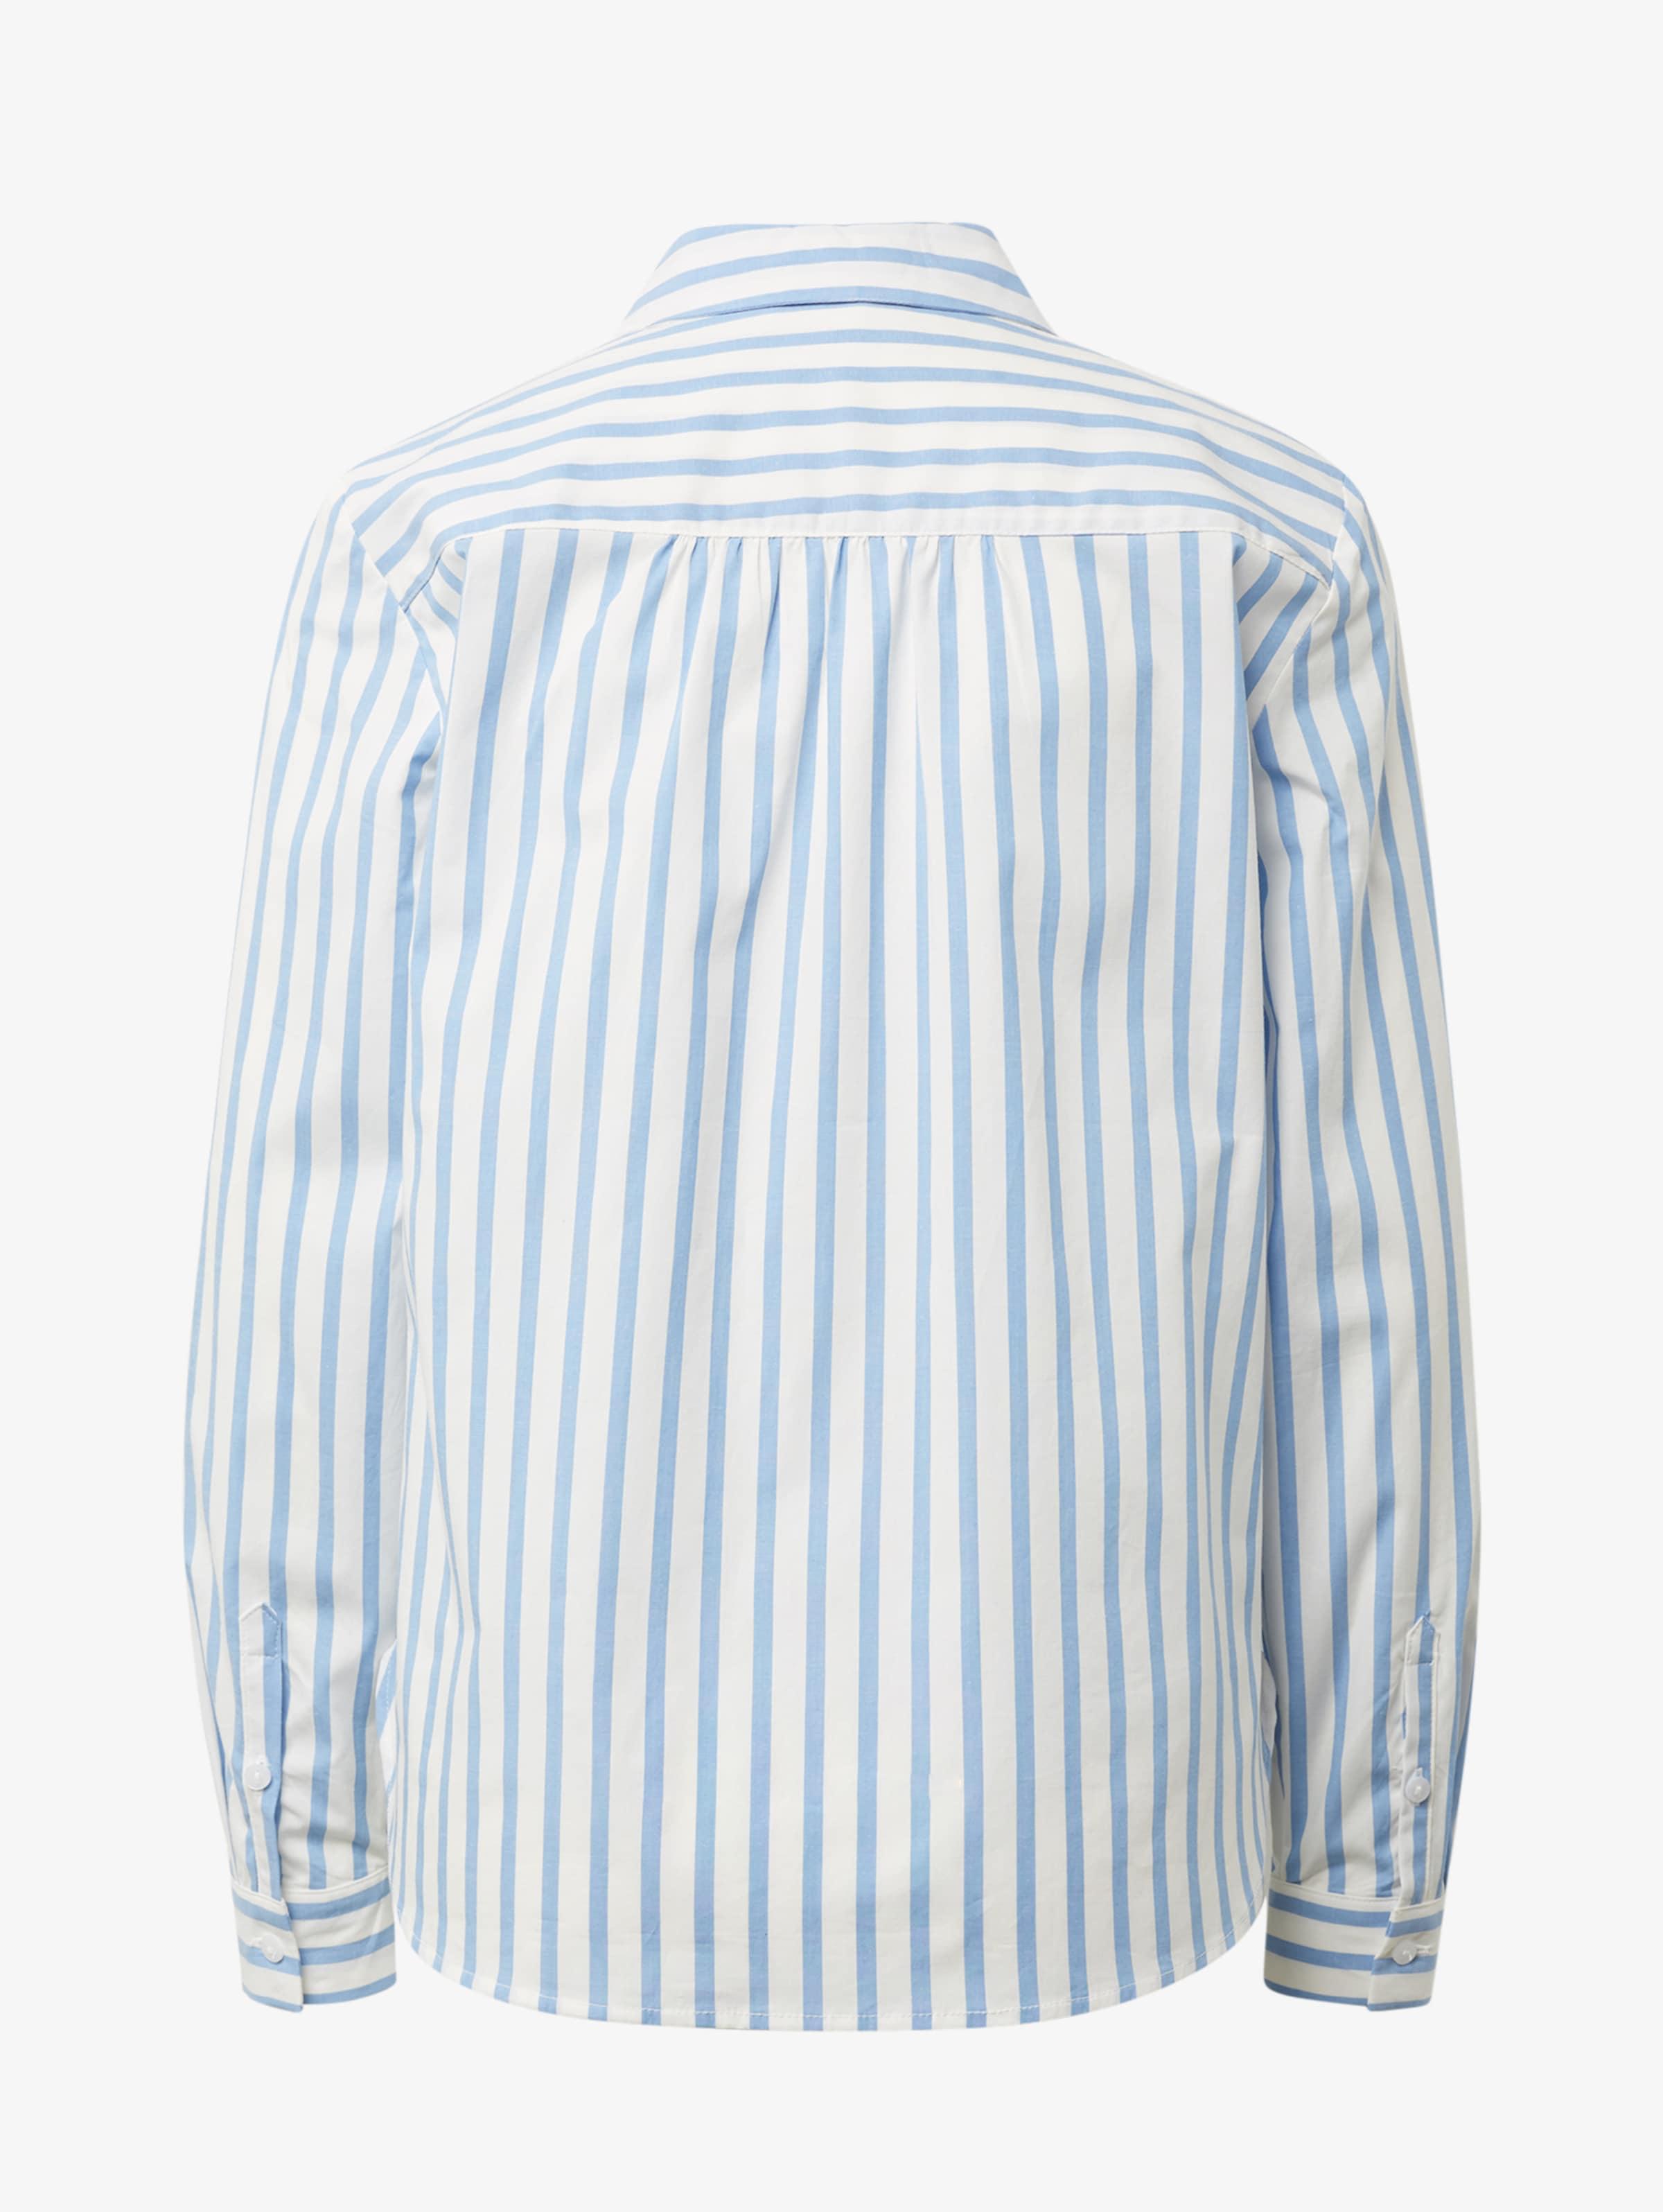 Tailor In Bluse In Tom In Bluse Bluse Tom Tailor Tom HellblauOffwhite Tailor HellblauOffwhite dCtQrsh